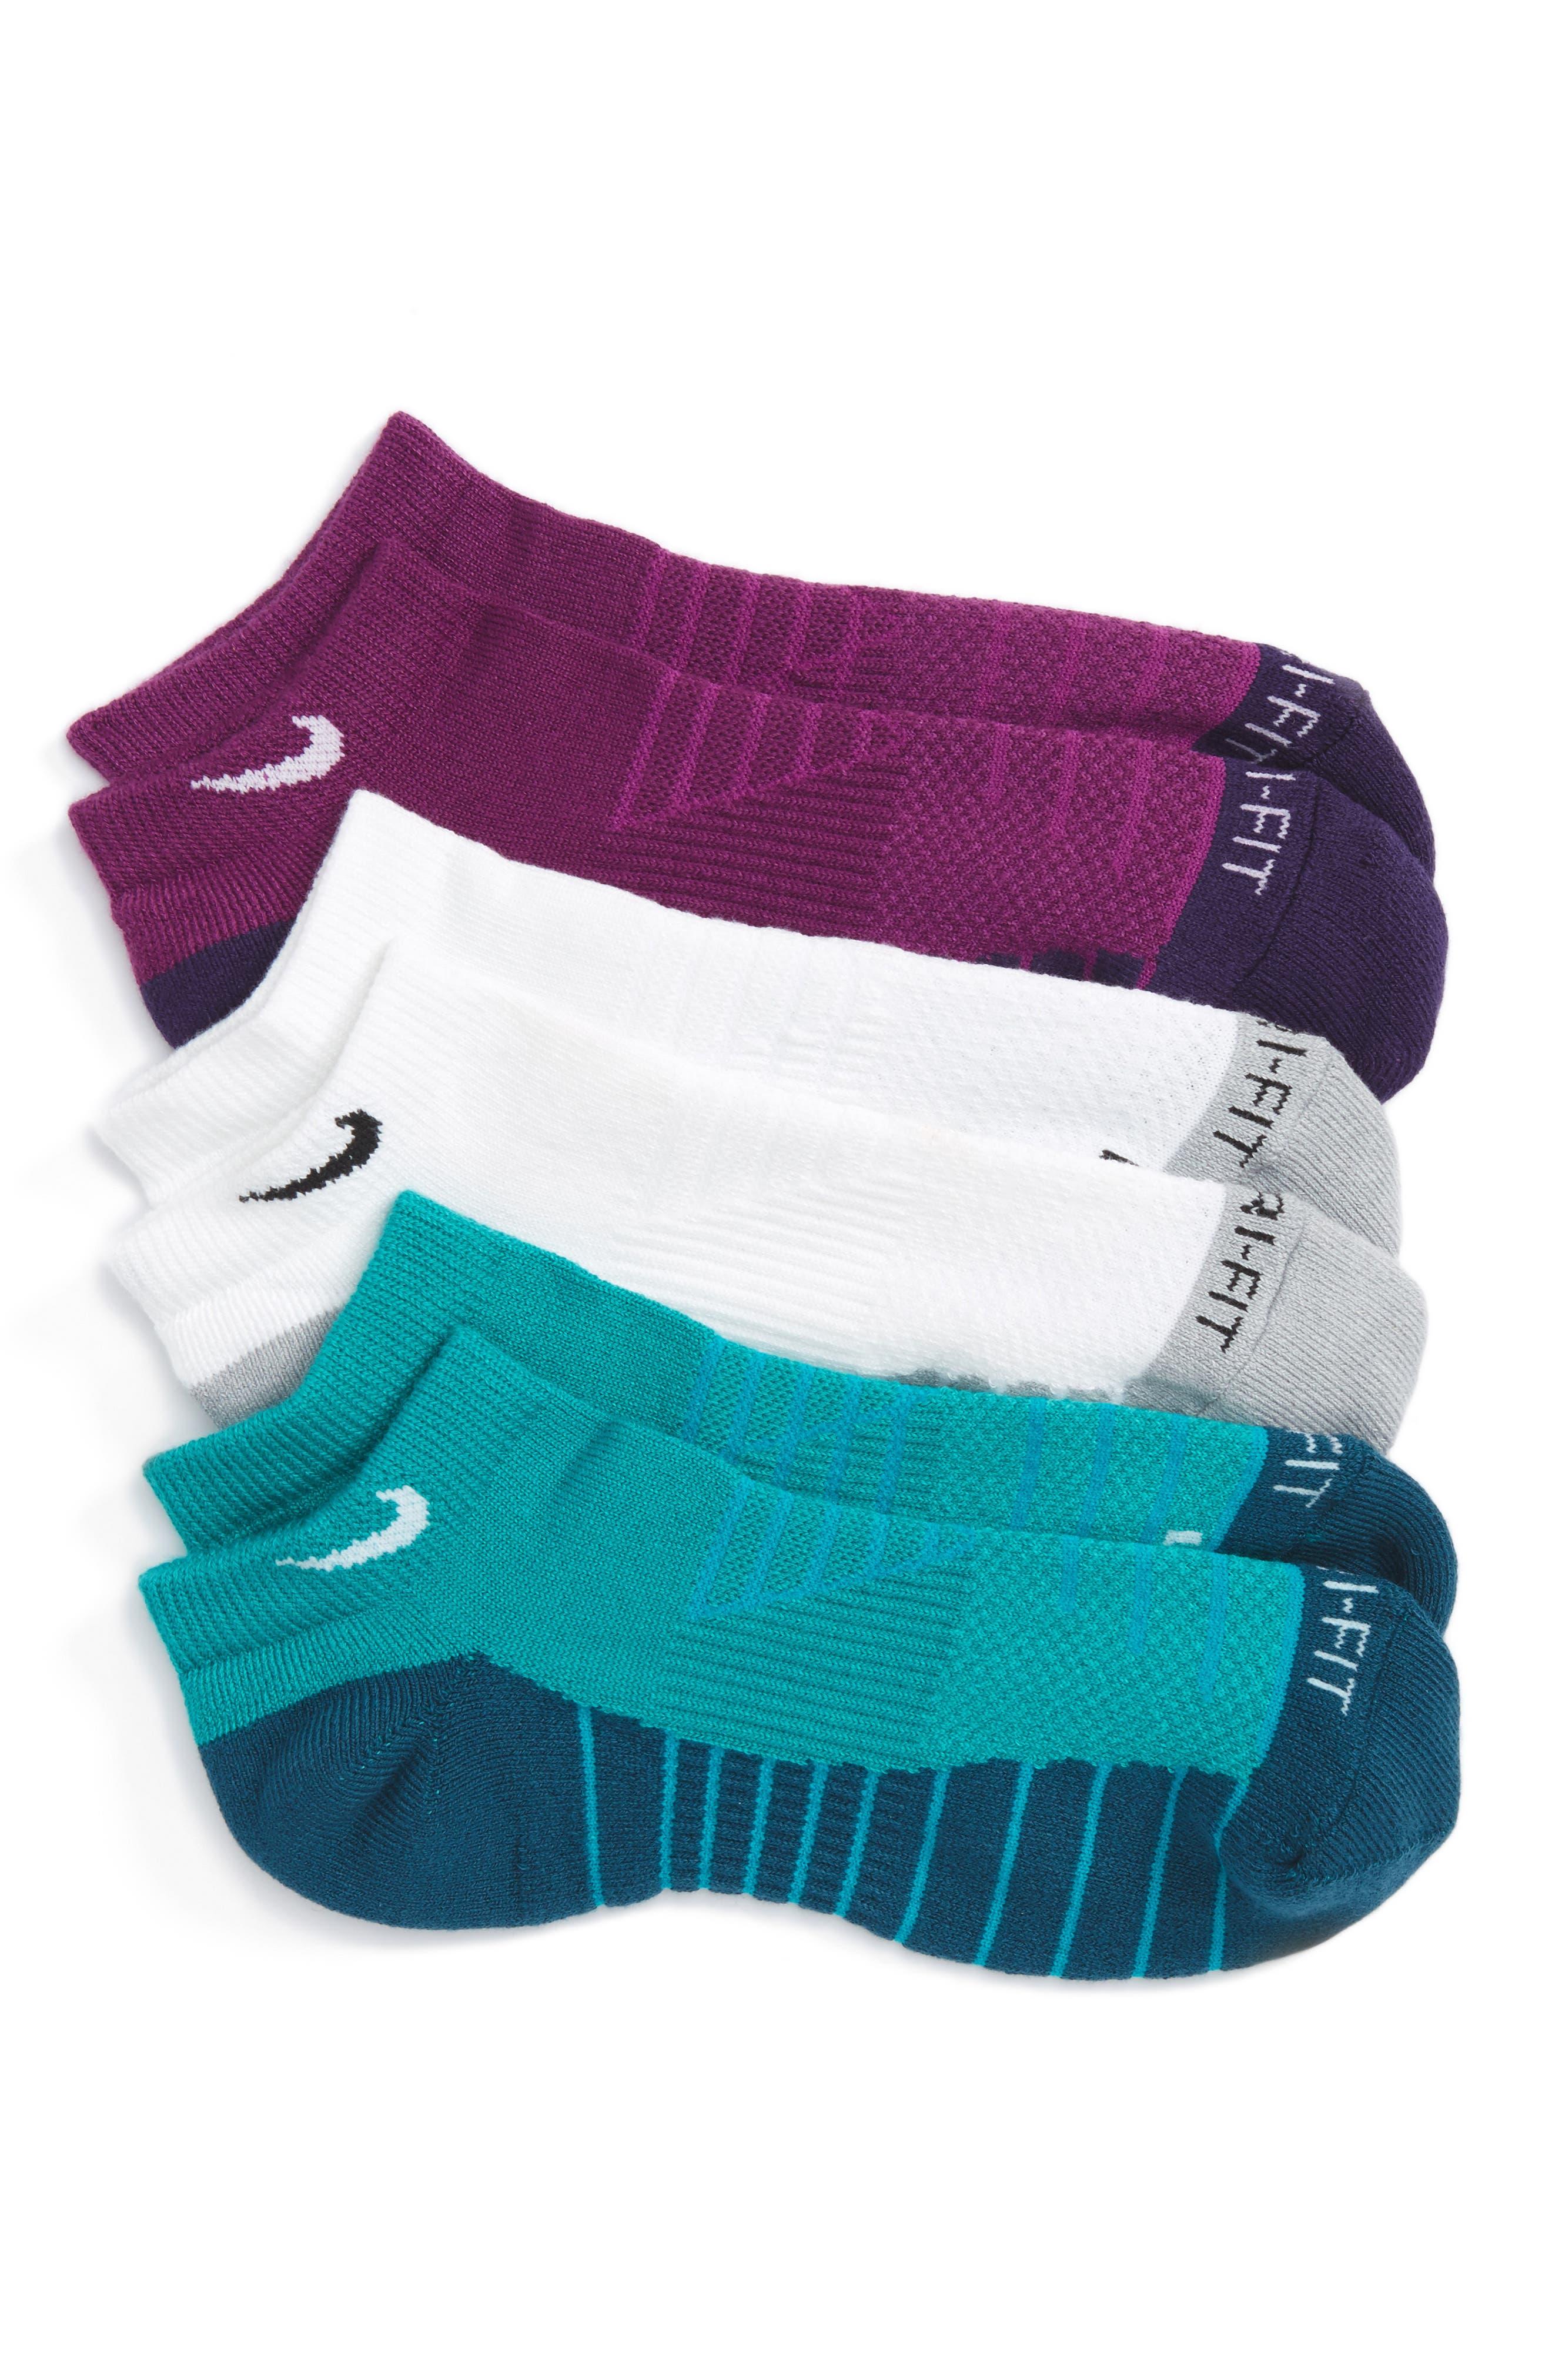 Main Image - Nike 3-Pack Cushioned Dri-FIT No-Show Socks (Big Kid)